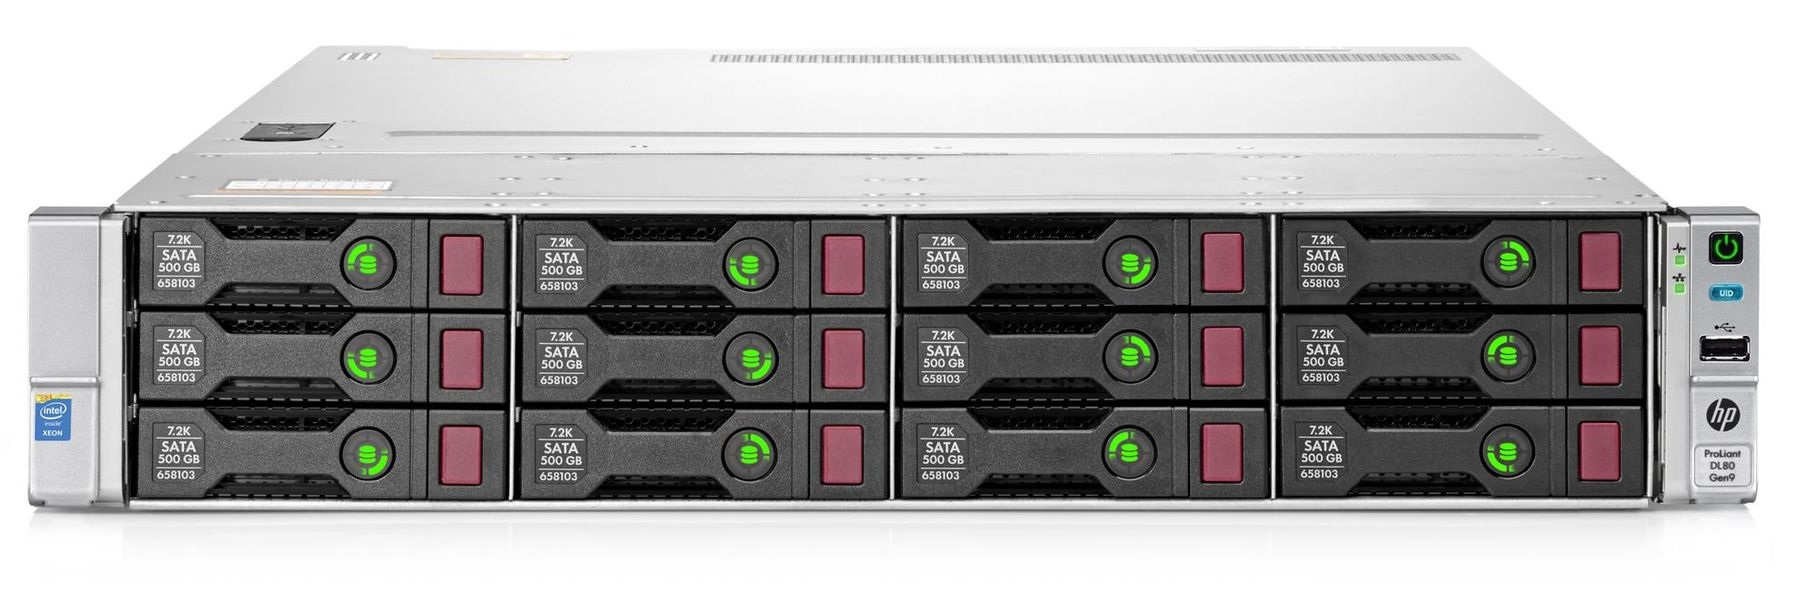 Сервер HP DL380 Gen9 12×3,5″